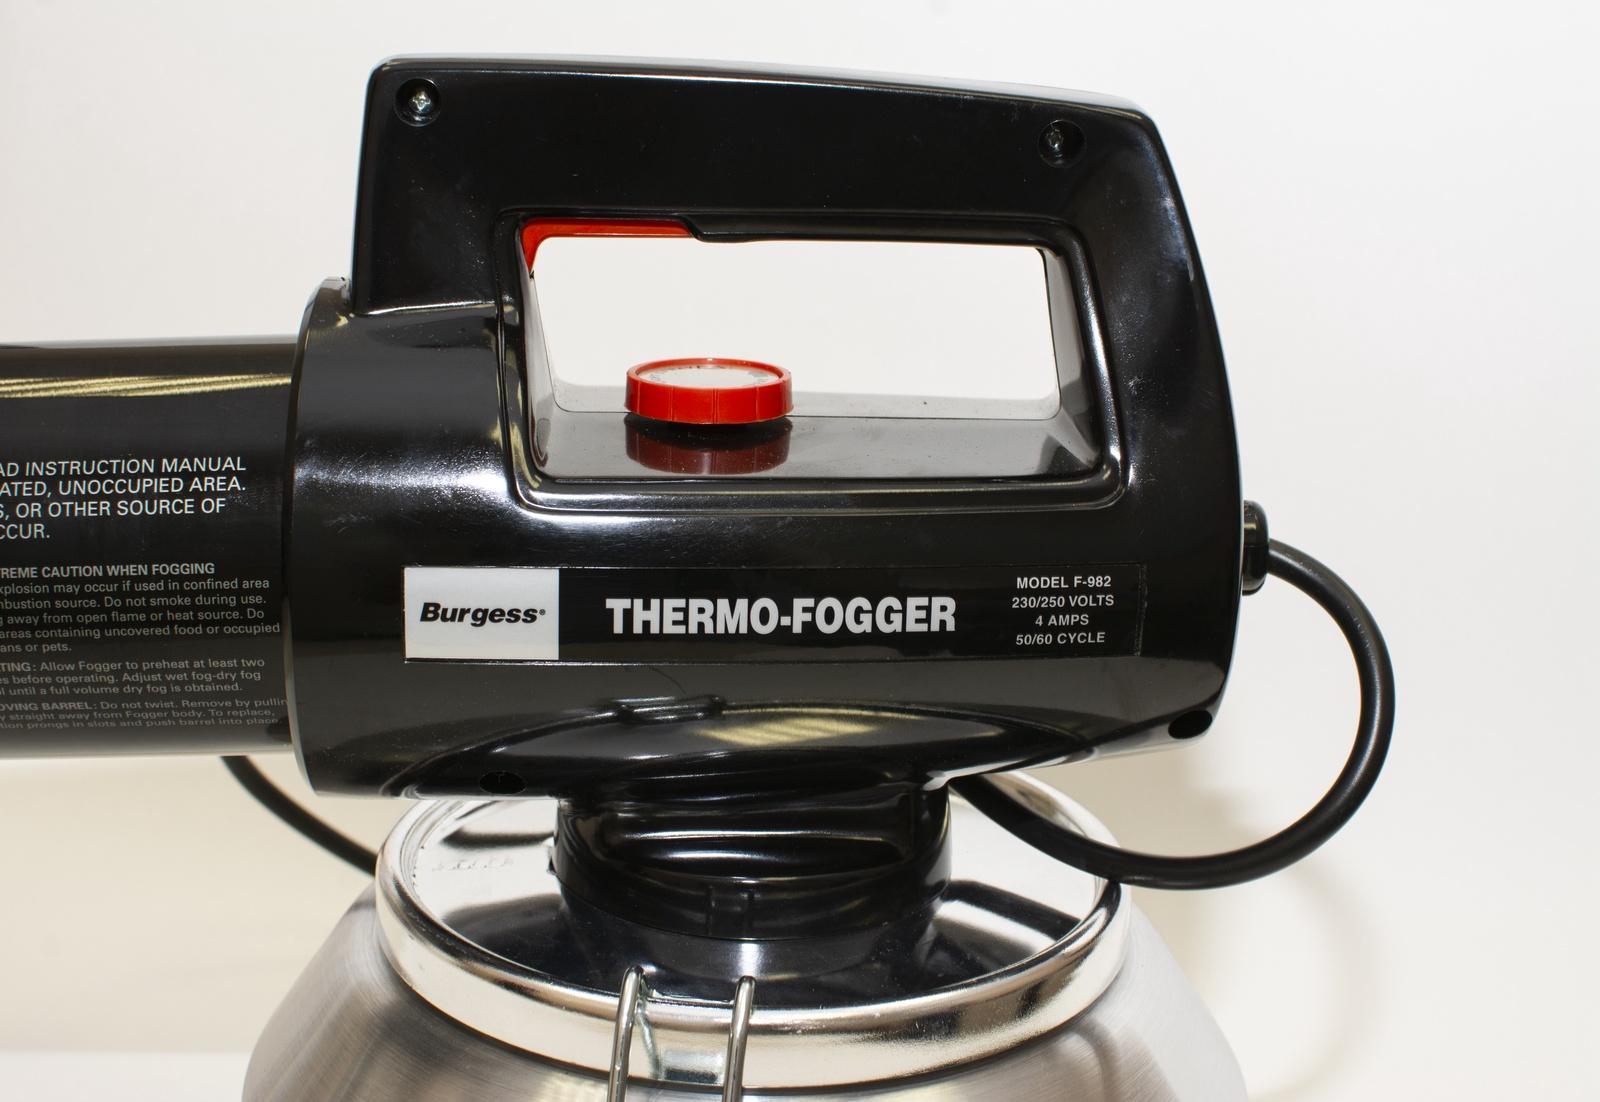 Генератор сухого тумана Burgess Thermo-Fogger Burgess